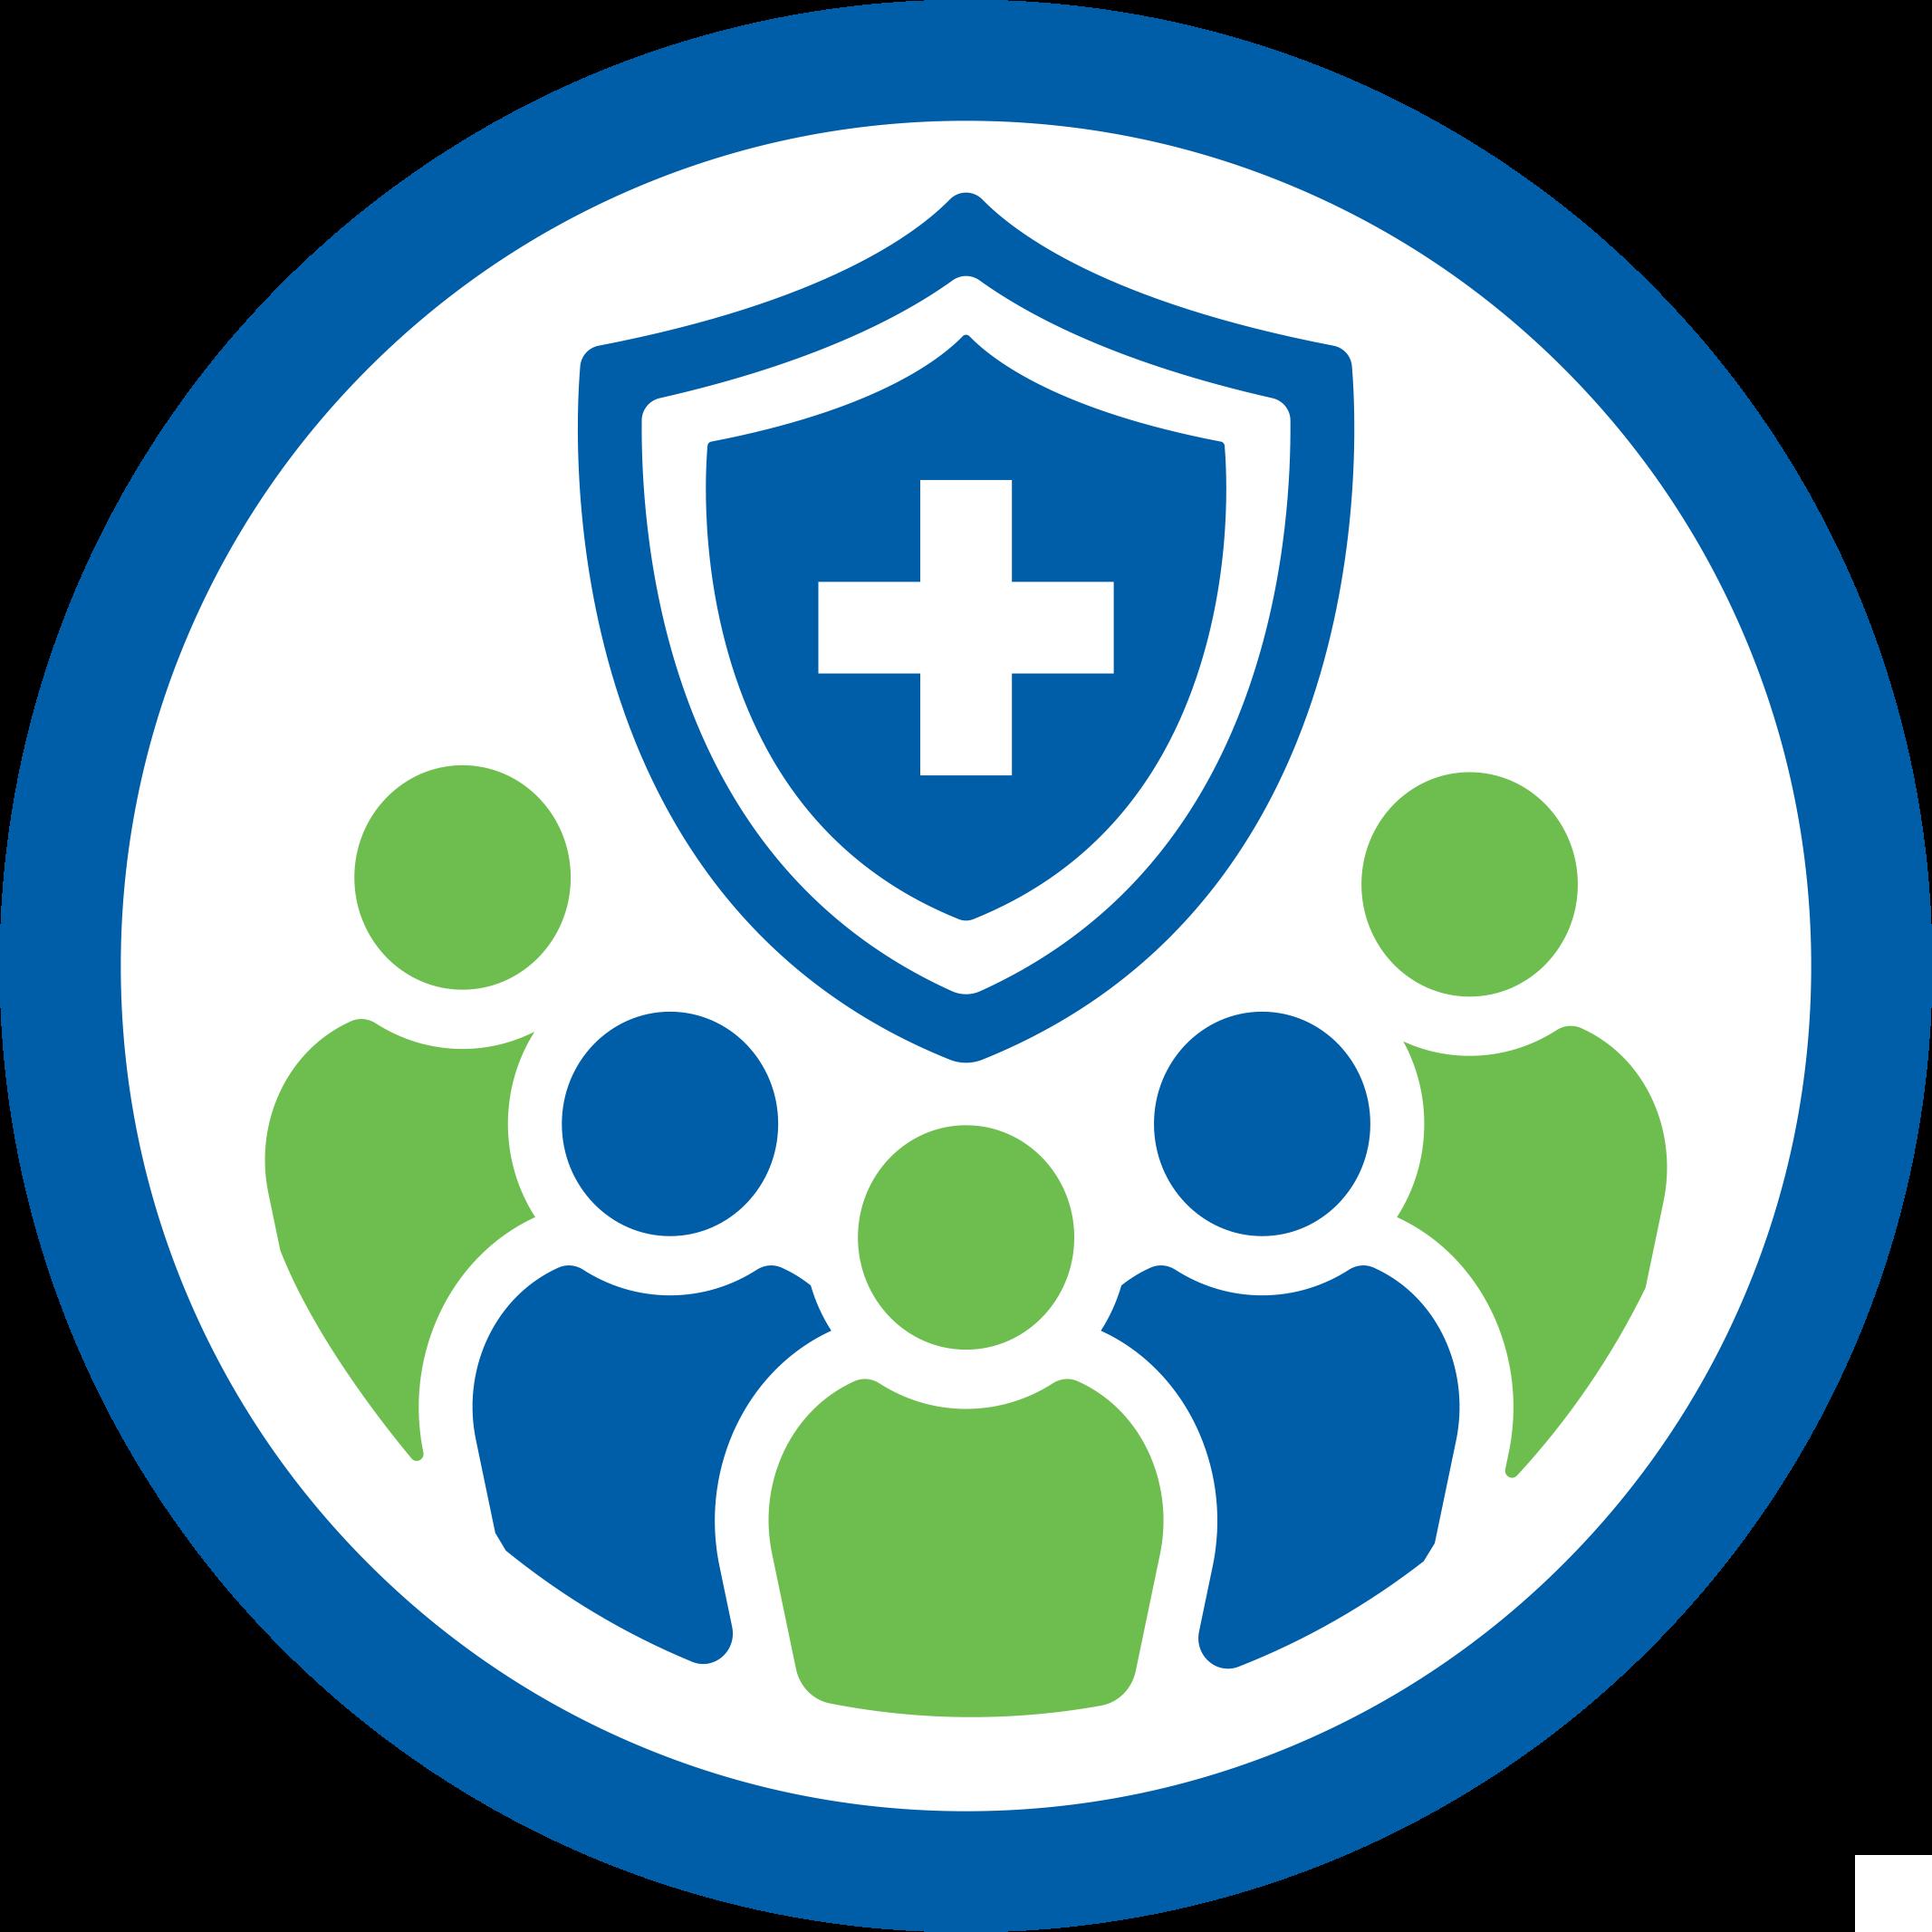 Employer Medicine icon